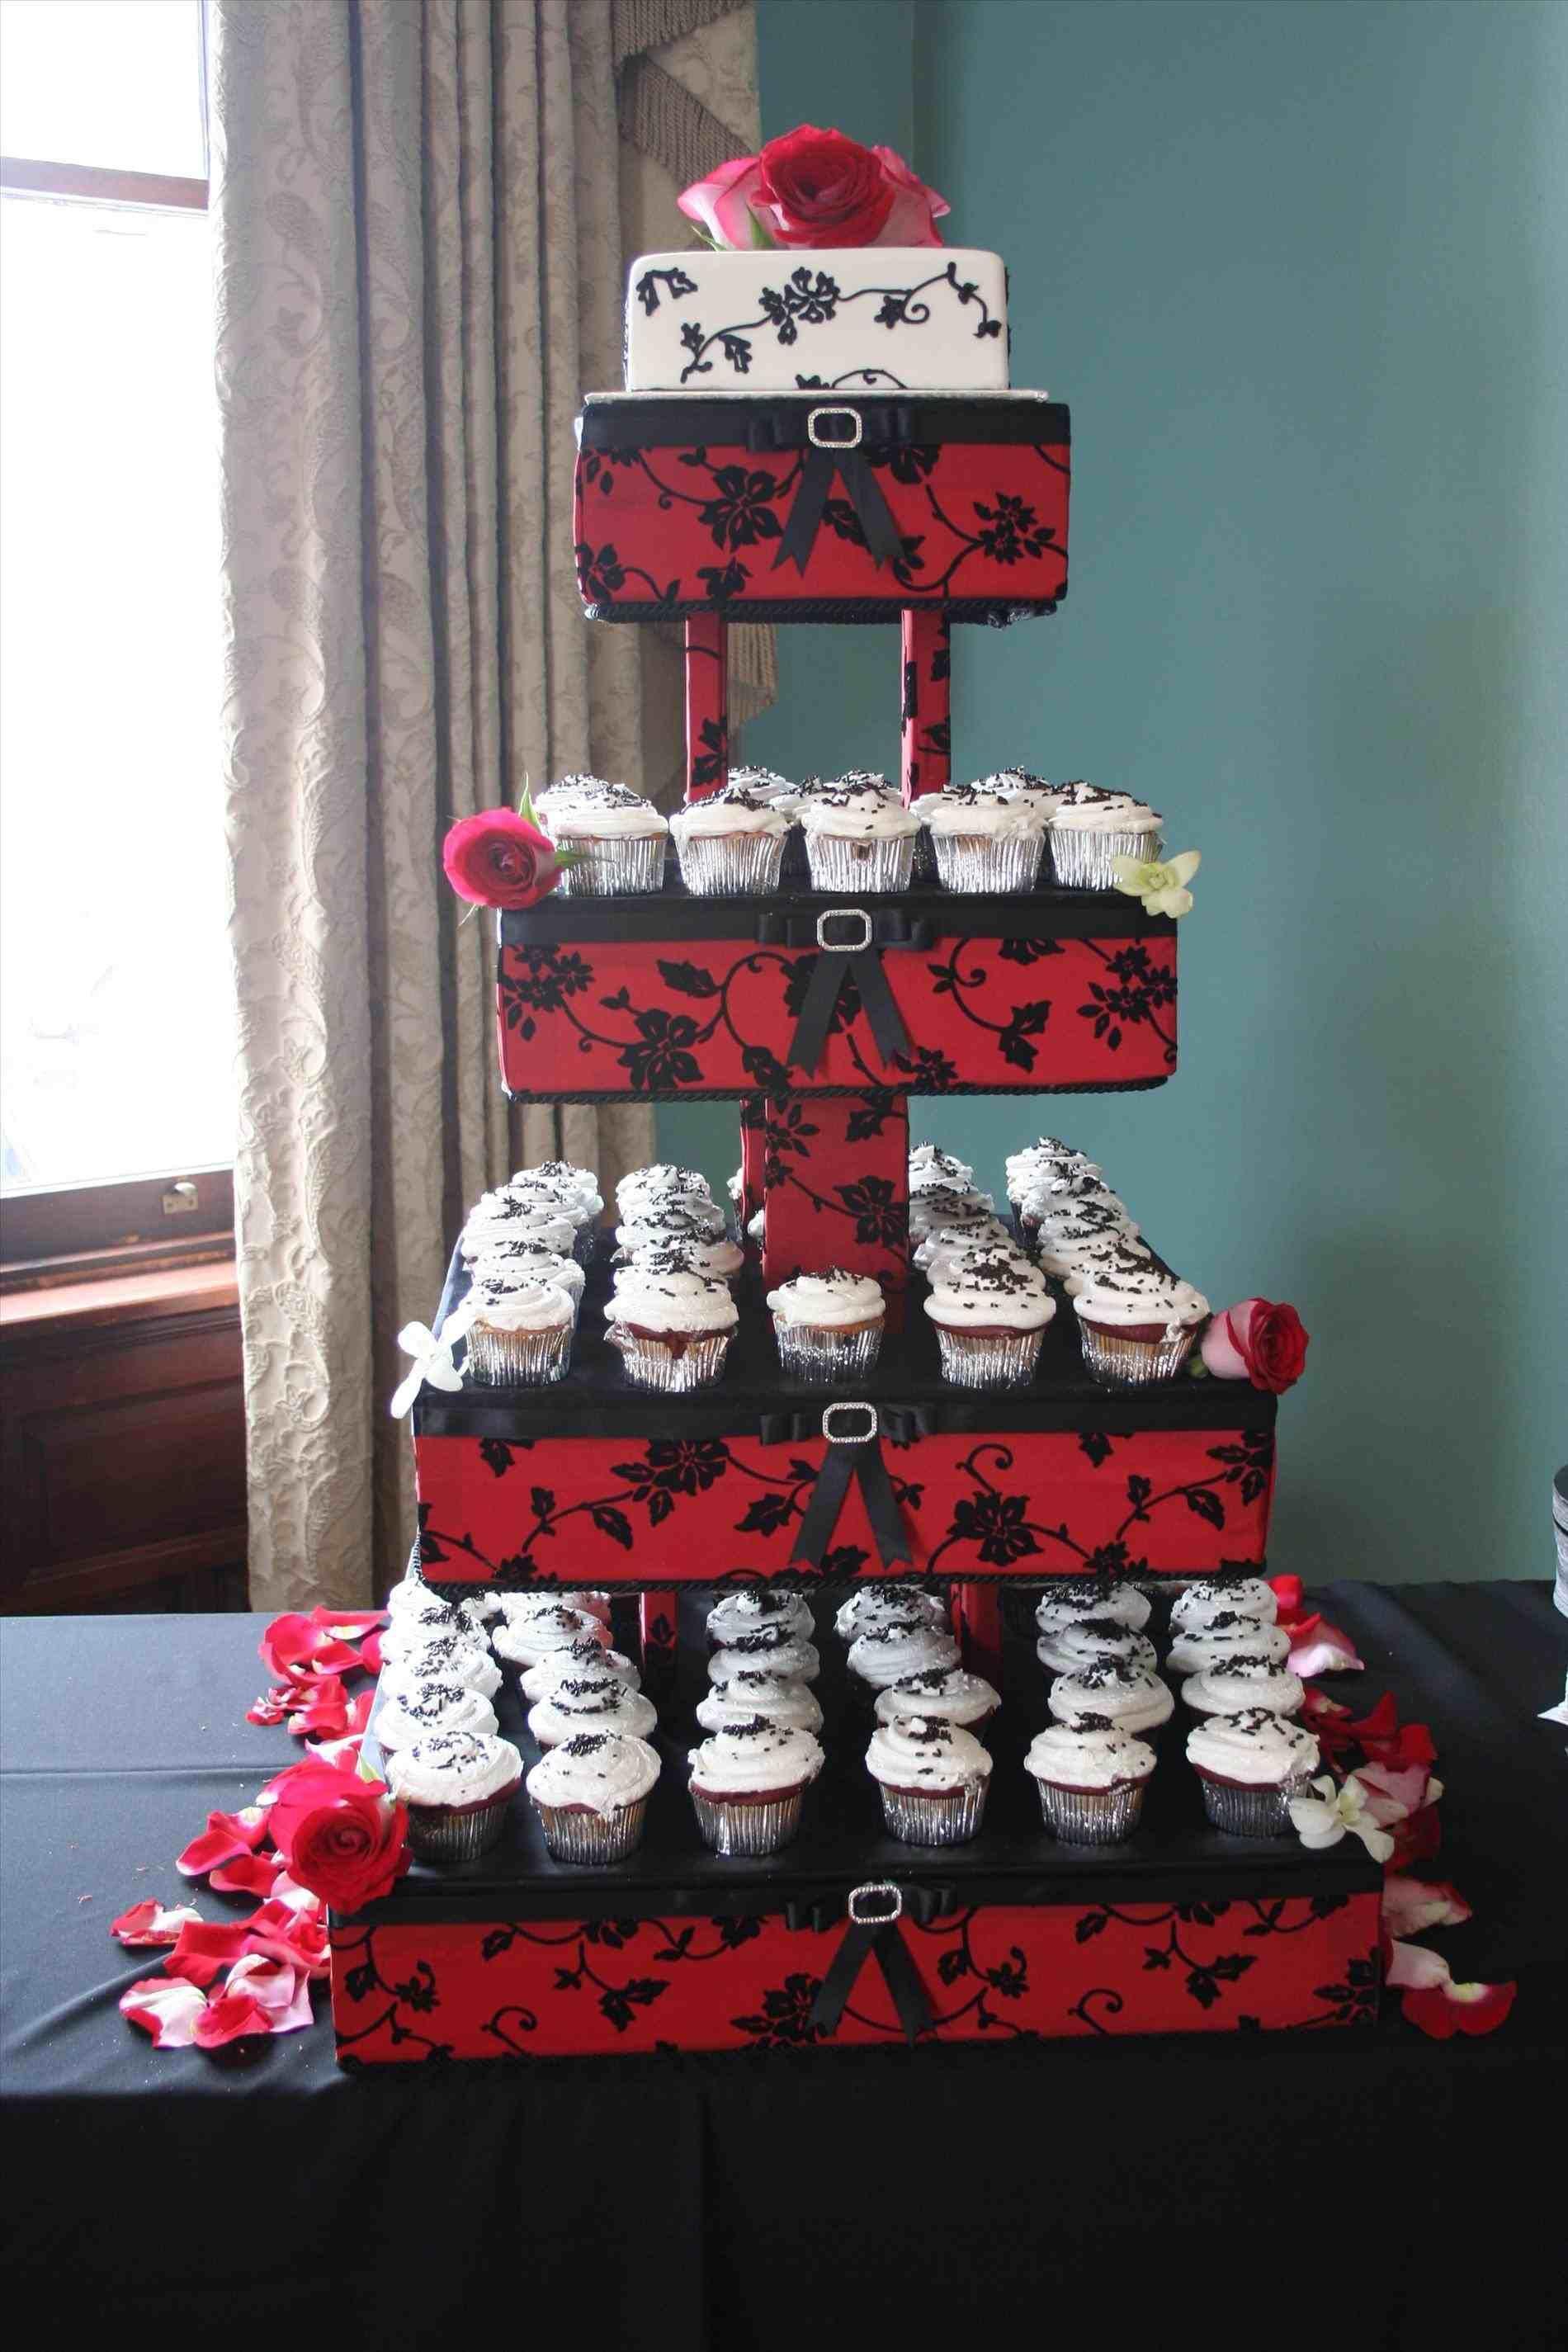 Red and black wedding dress  red and black wedding ideas  Weddings  Pinterest  Weddings